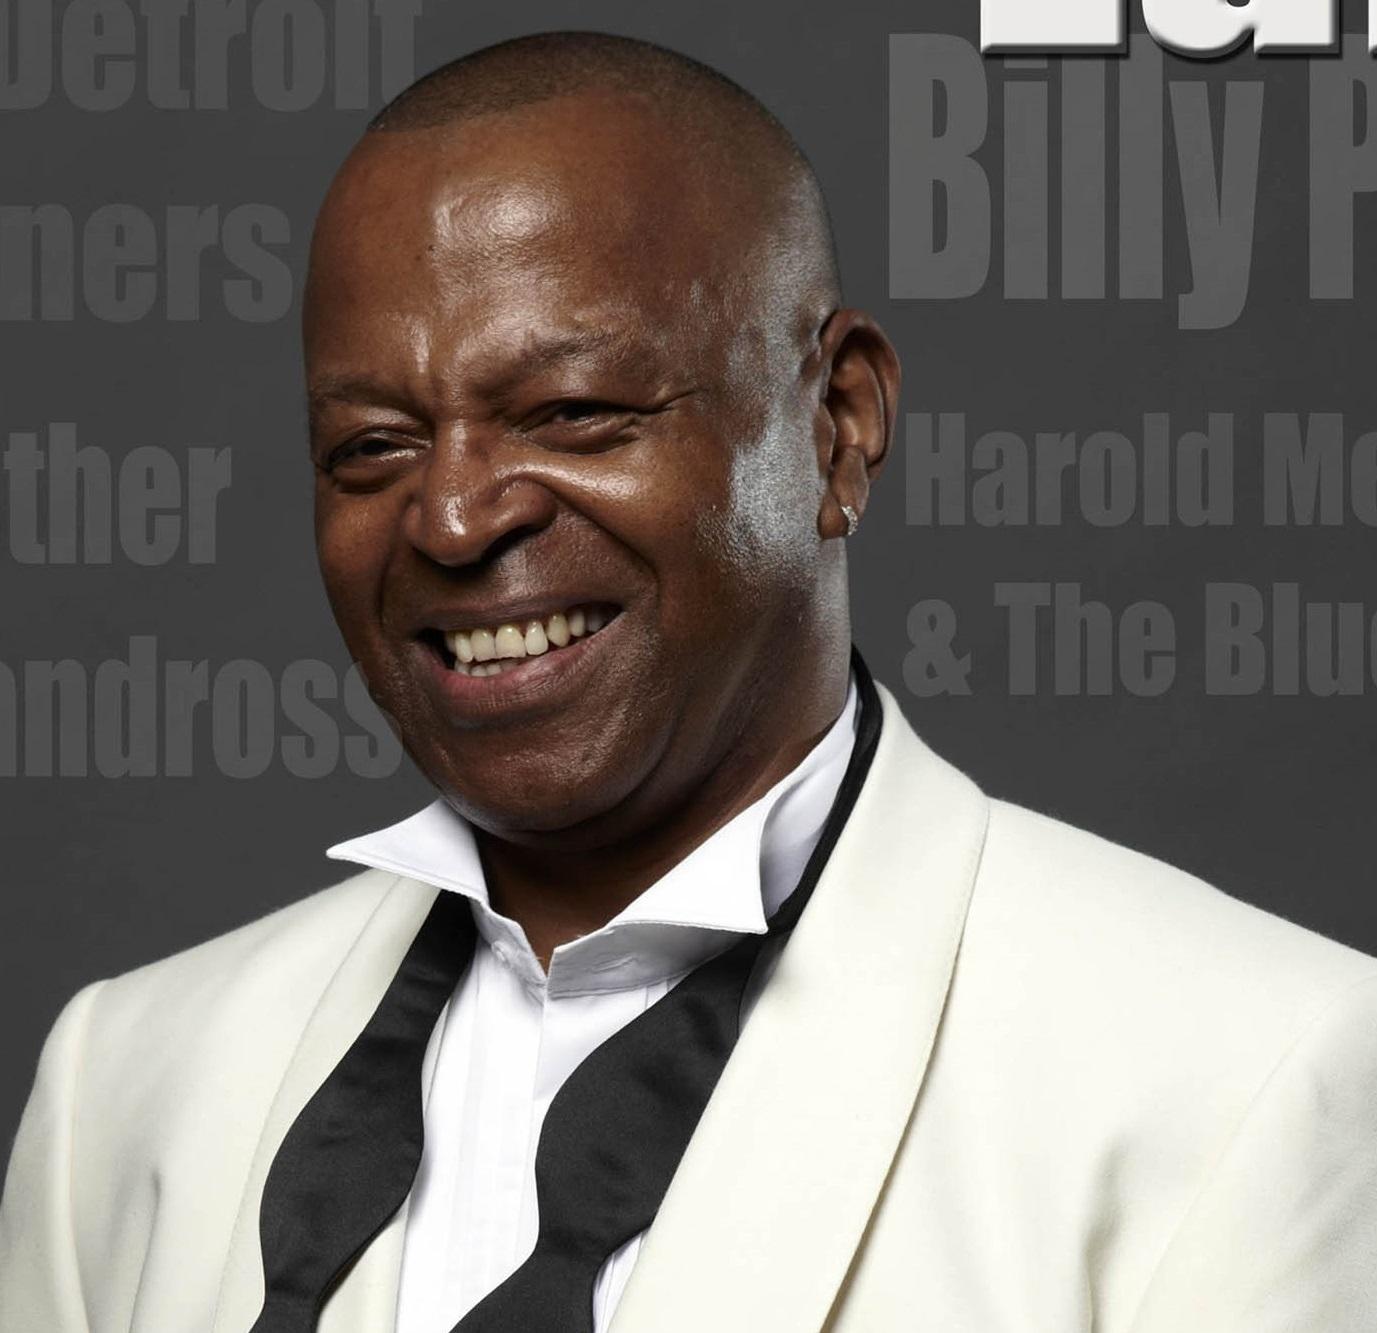 Lance Gold - Soul & Motown Singer - Vocalist